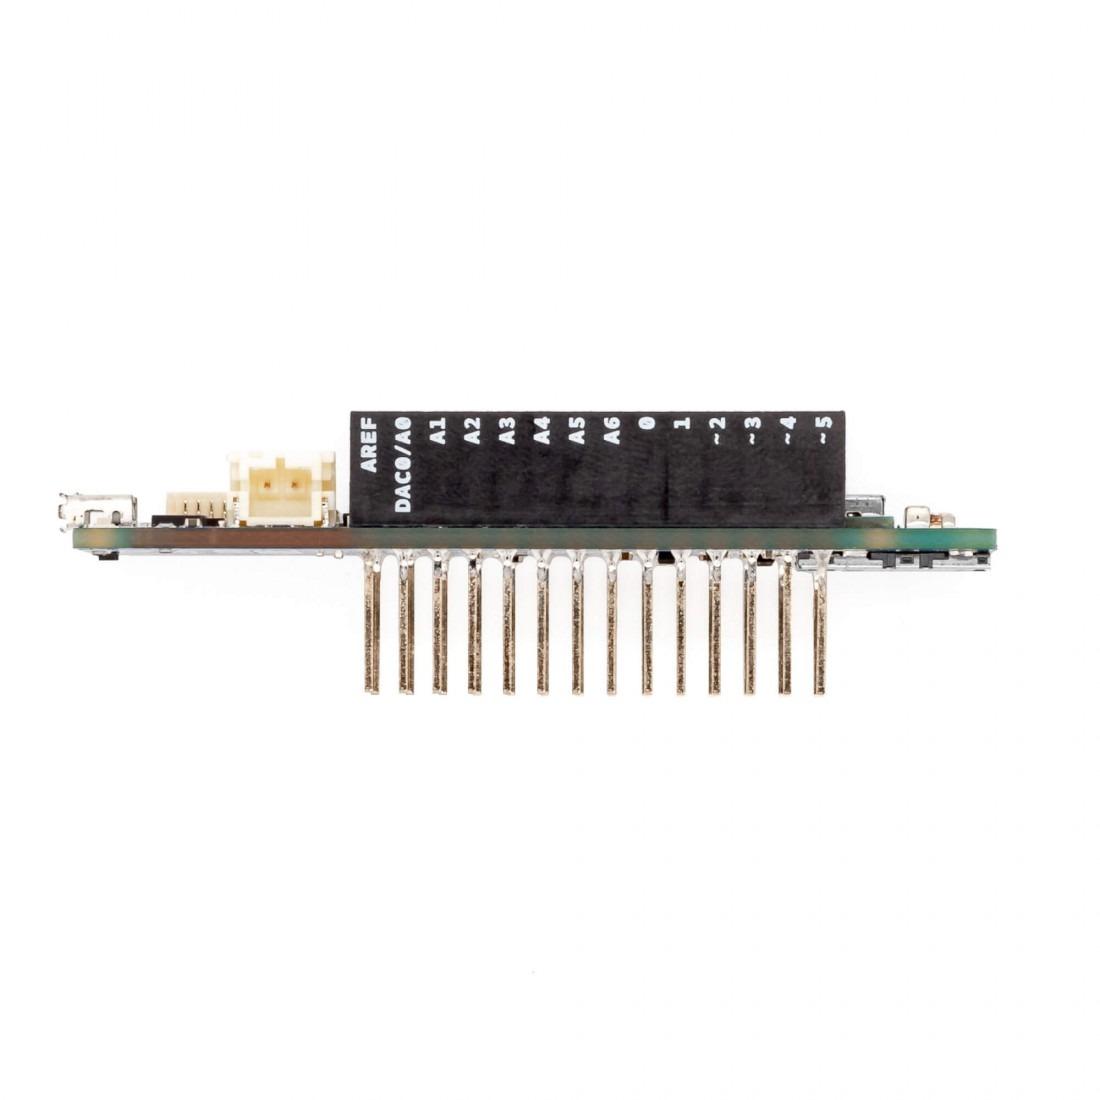 Soracom LTE-M IoT Connectivity Kit